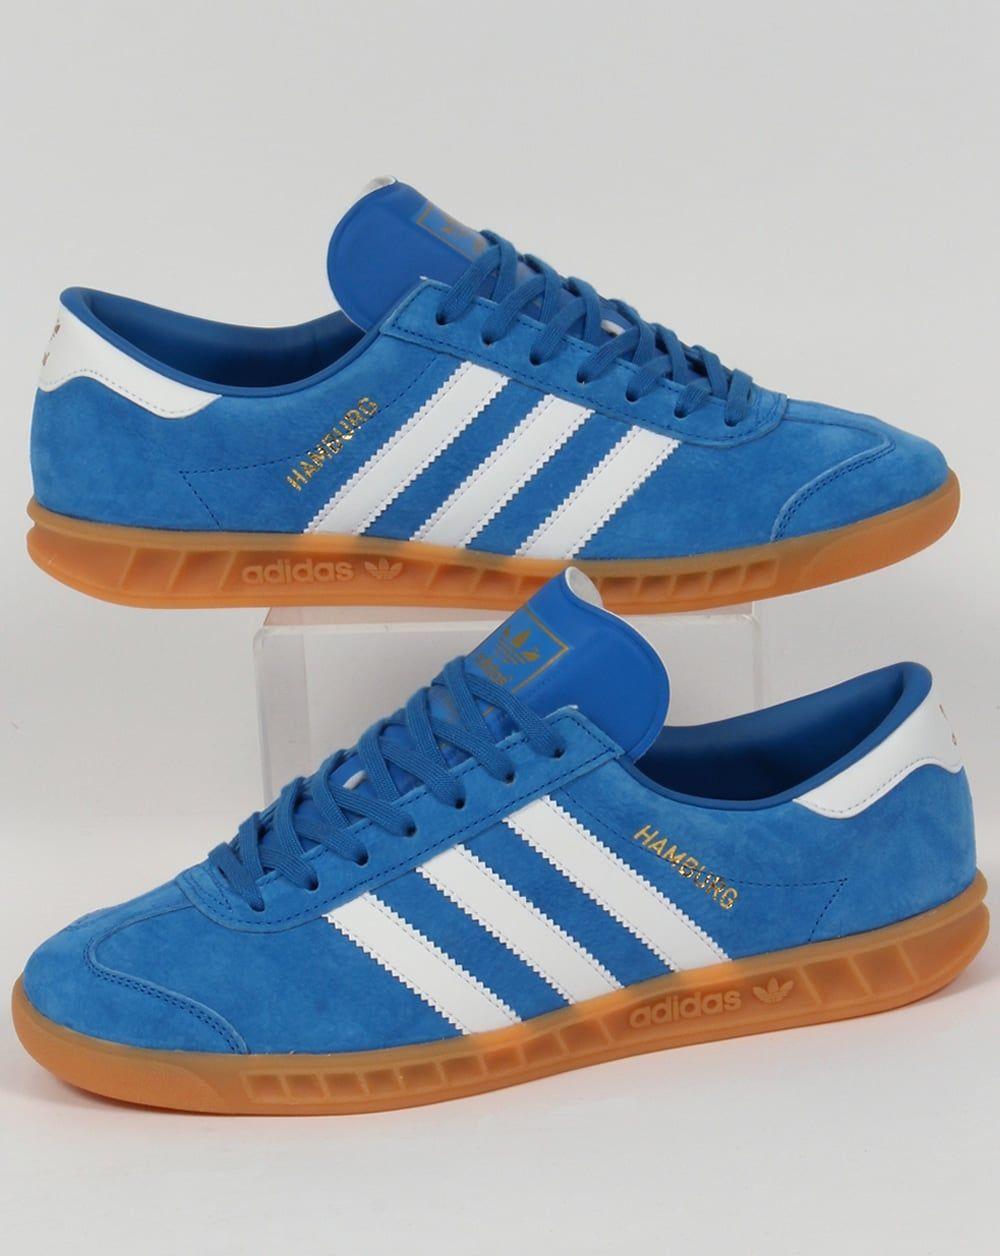 http://www.80scasualclassics.co.uk/images/adidas-hamburg-trainers ...